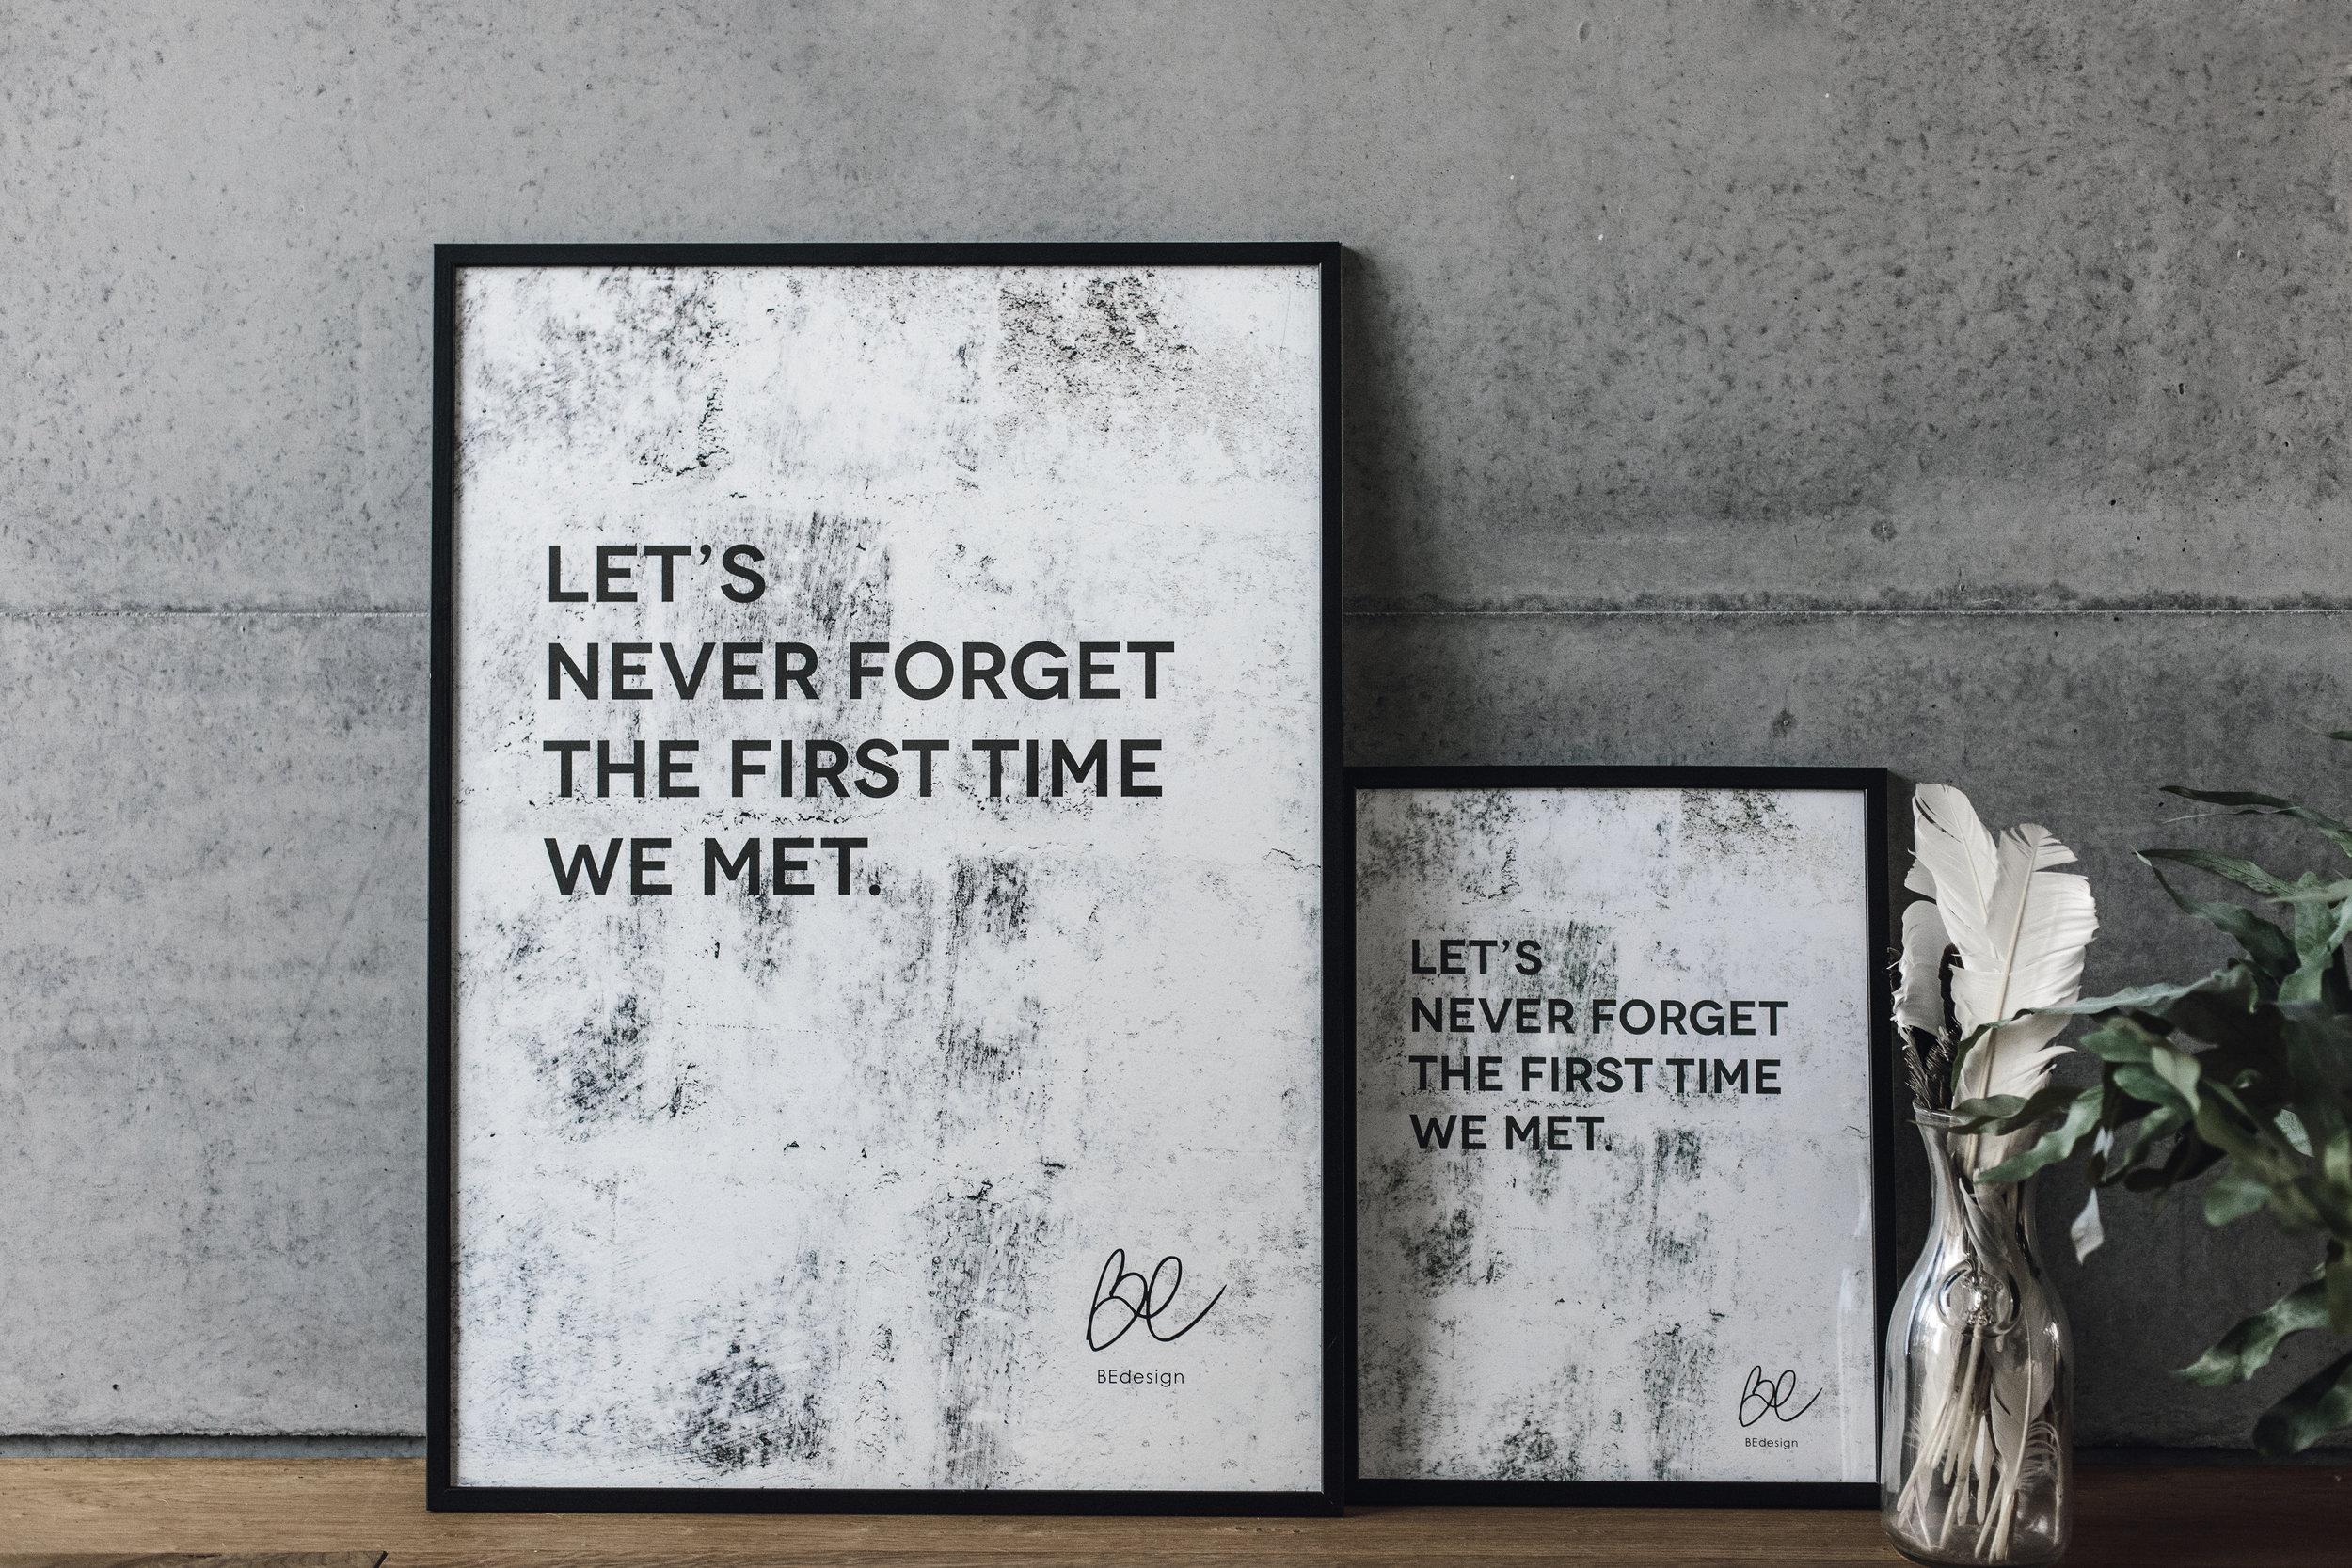 BEdesign_Let's_never_forget_poster_50x70_A3_1_300dpi.jpg